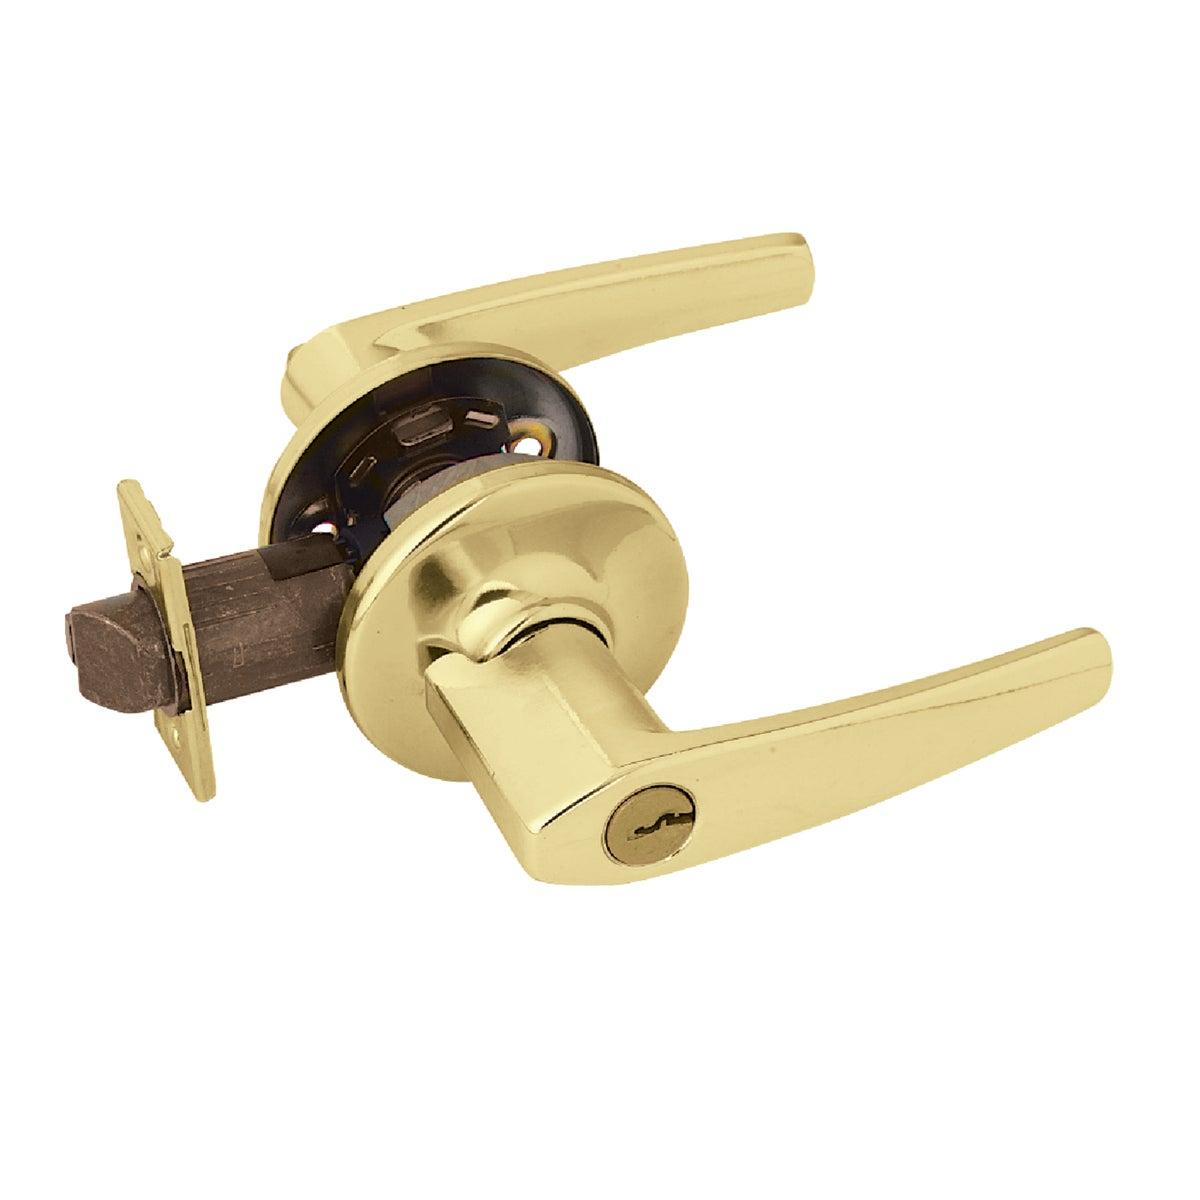 PB CP DELTA ENTRY LOCK - 405DL 3 CP K6 by Kwikset